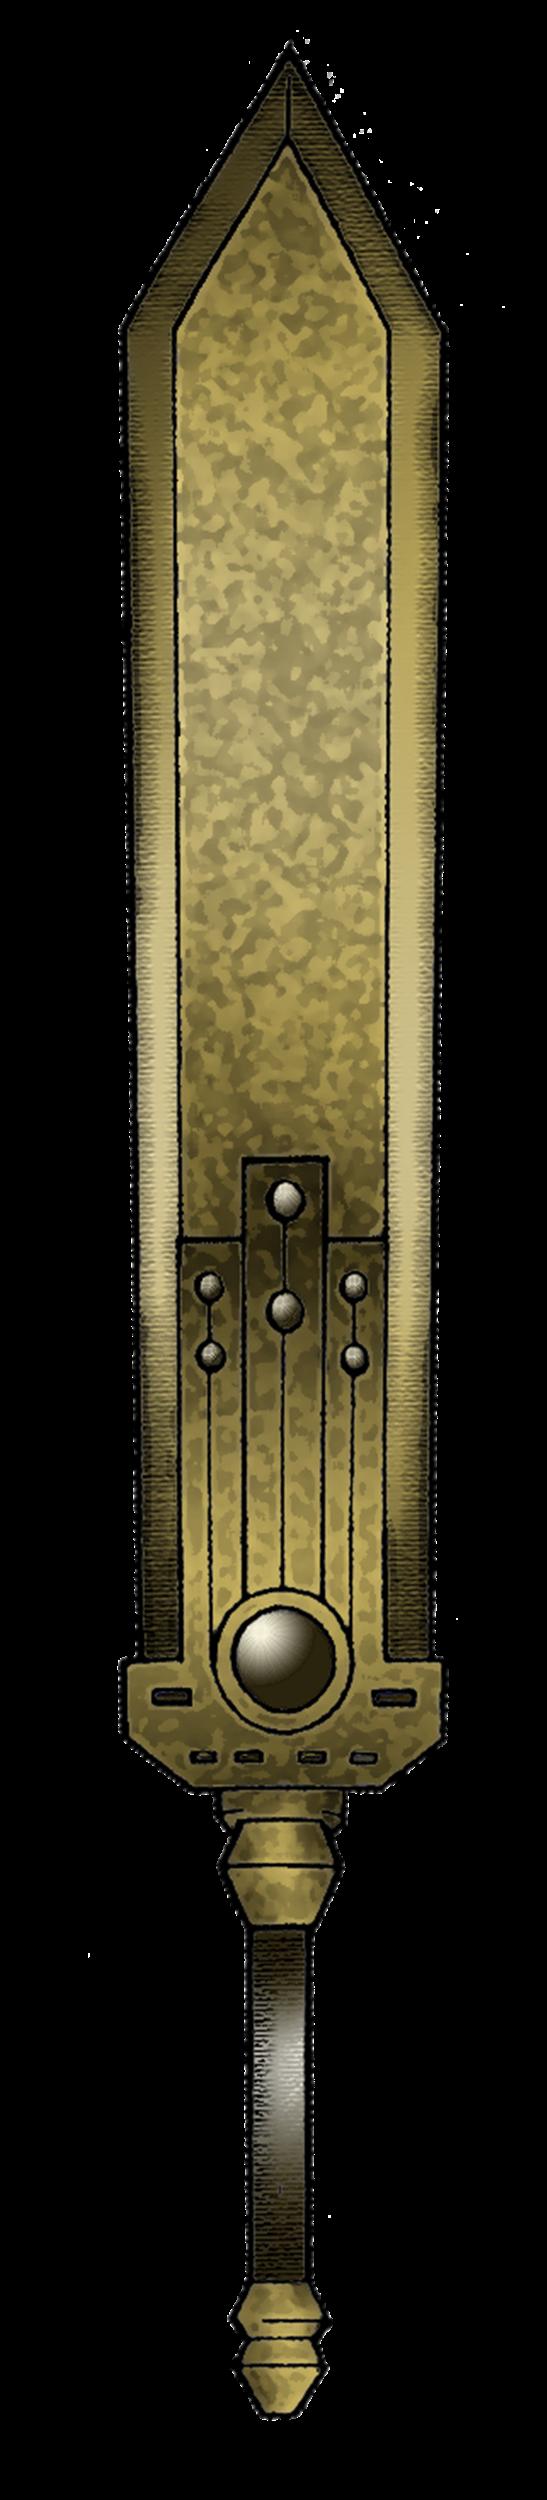 Drakengard 2 Faq / Walkthrough - GameRevolution